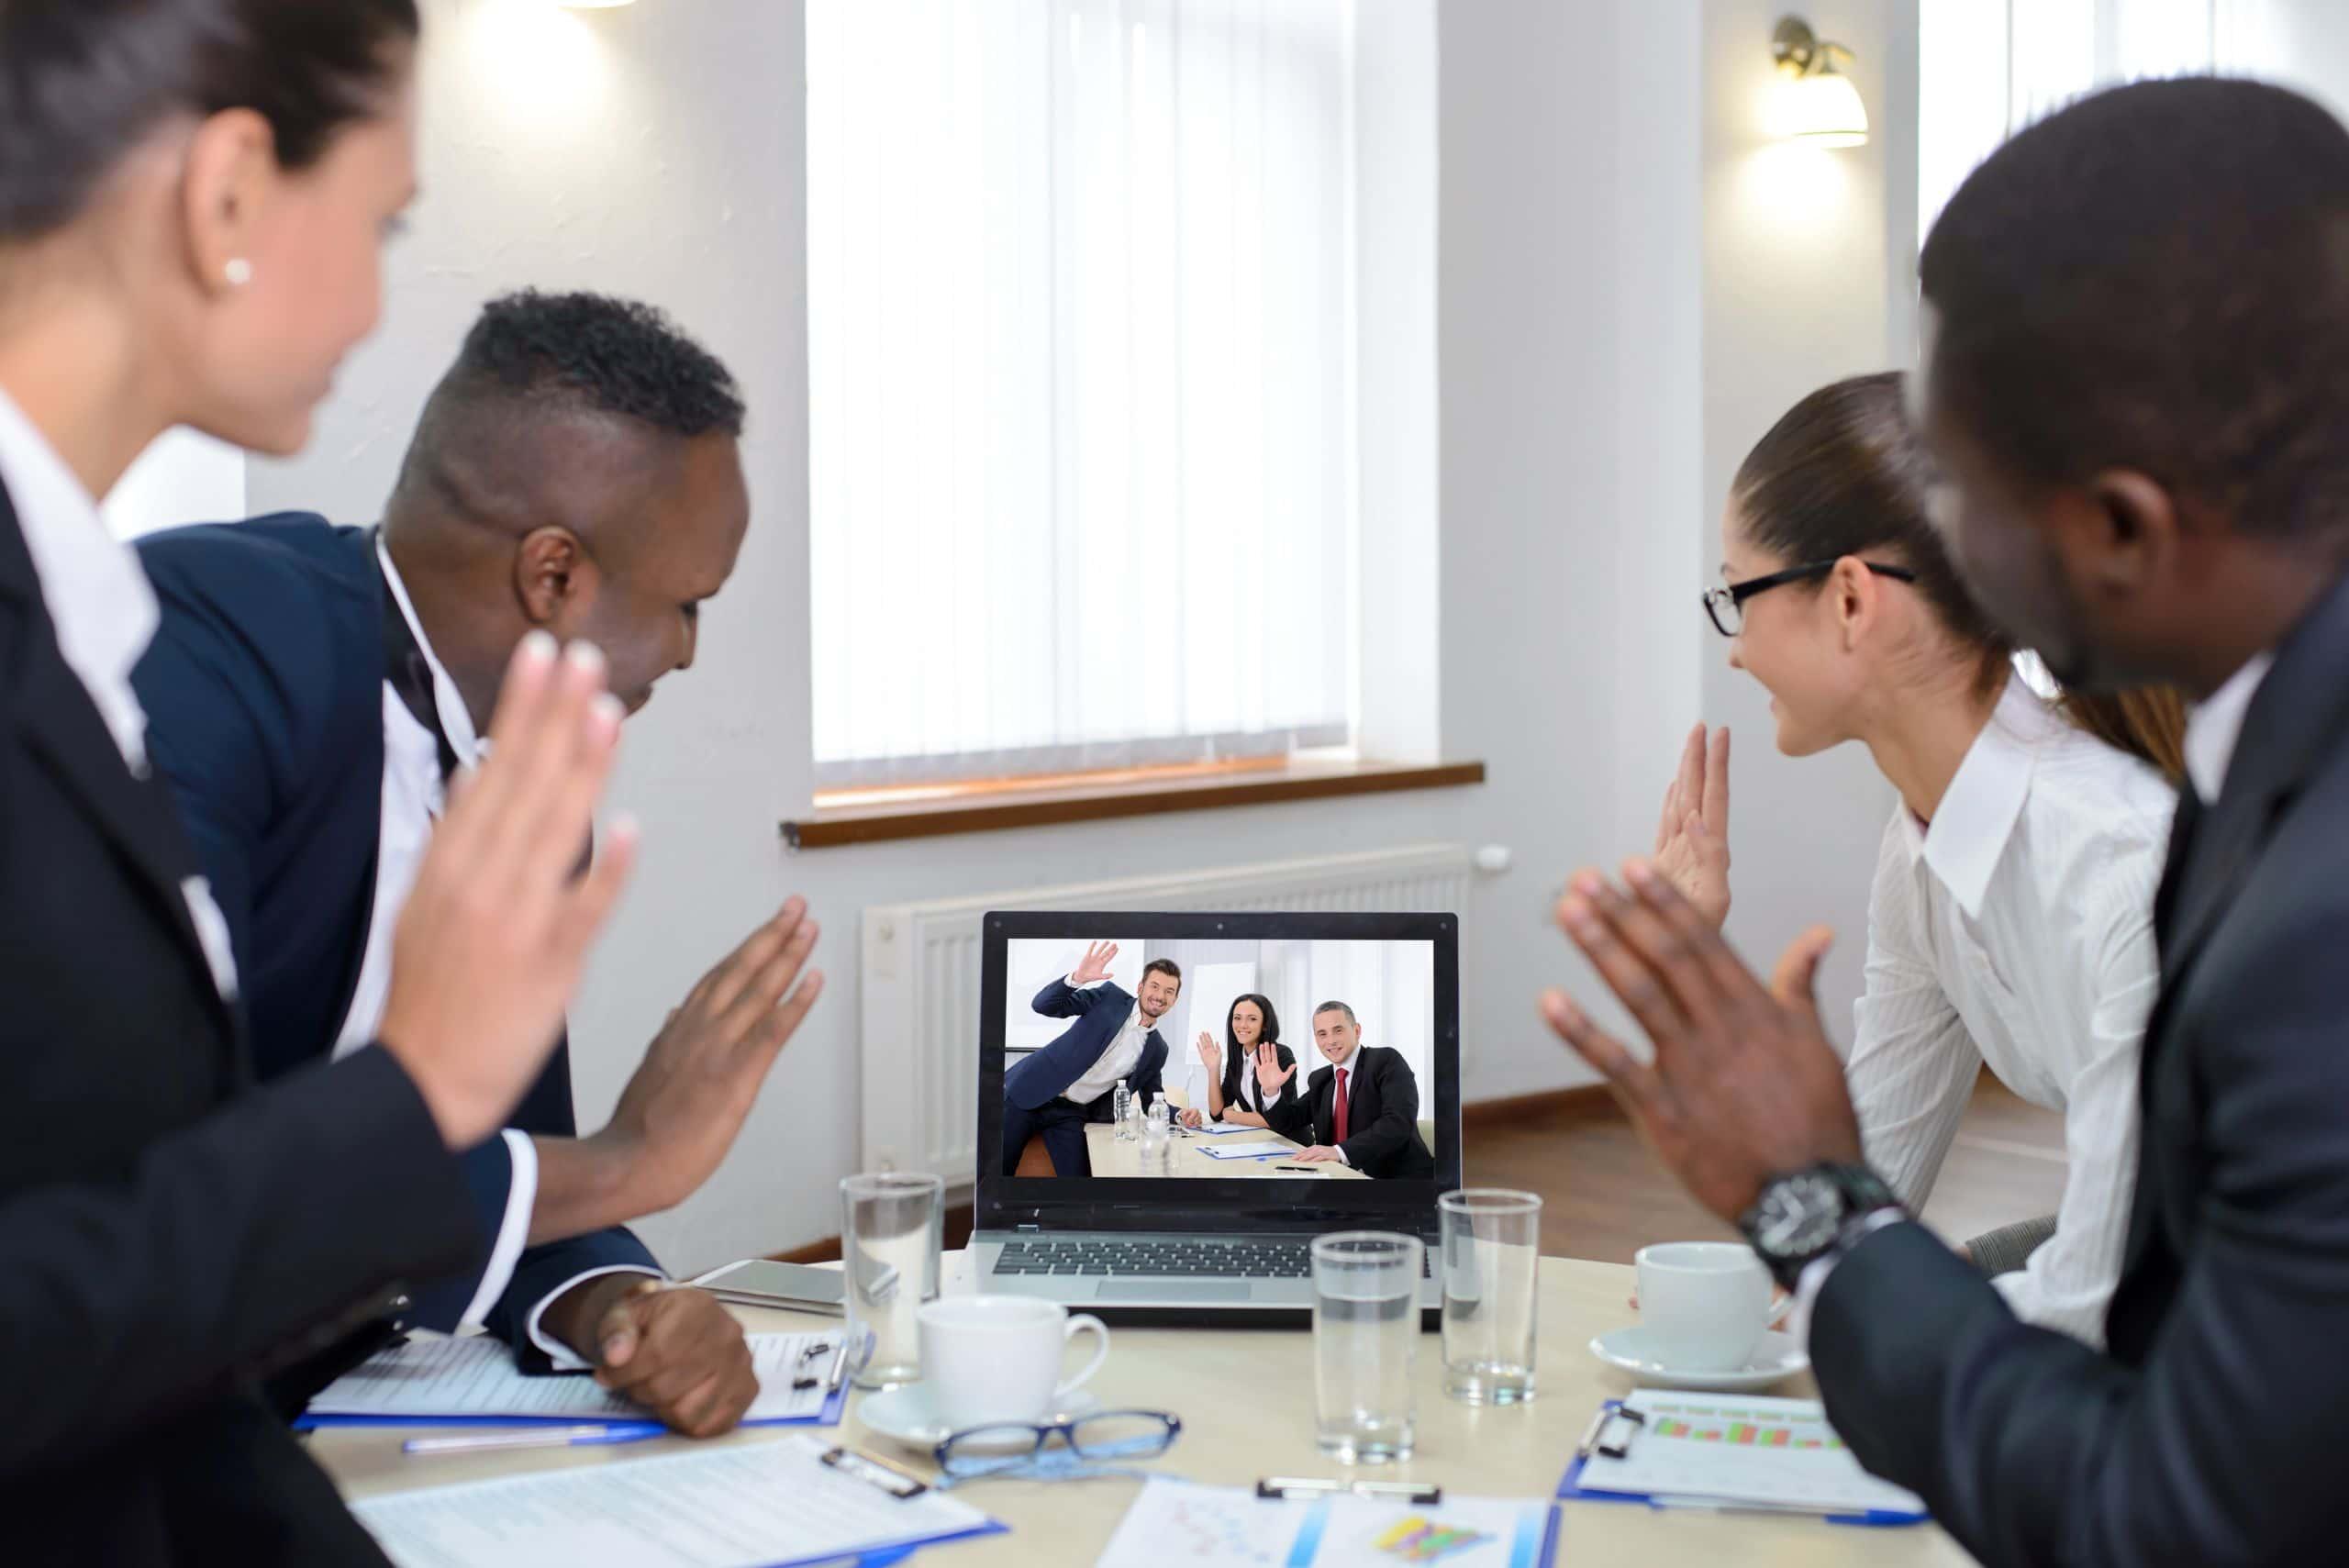 Lagmøte som videokonferanse